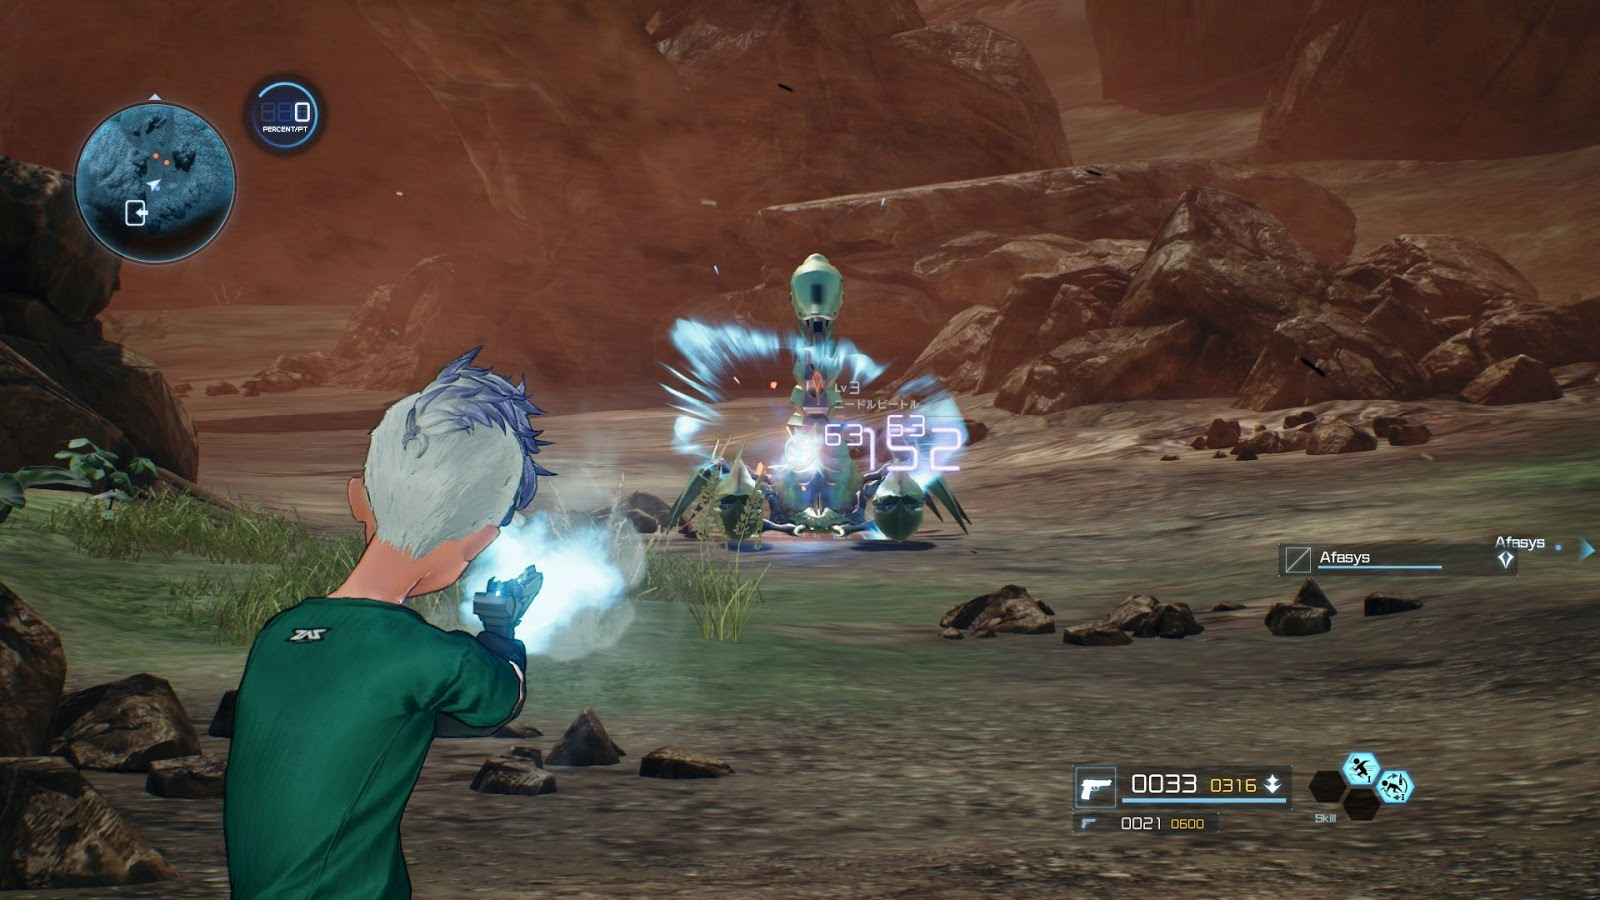 Sword Art Online: Fatal Bullet Review - XBLN by Team XBLN